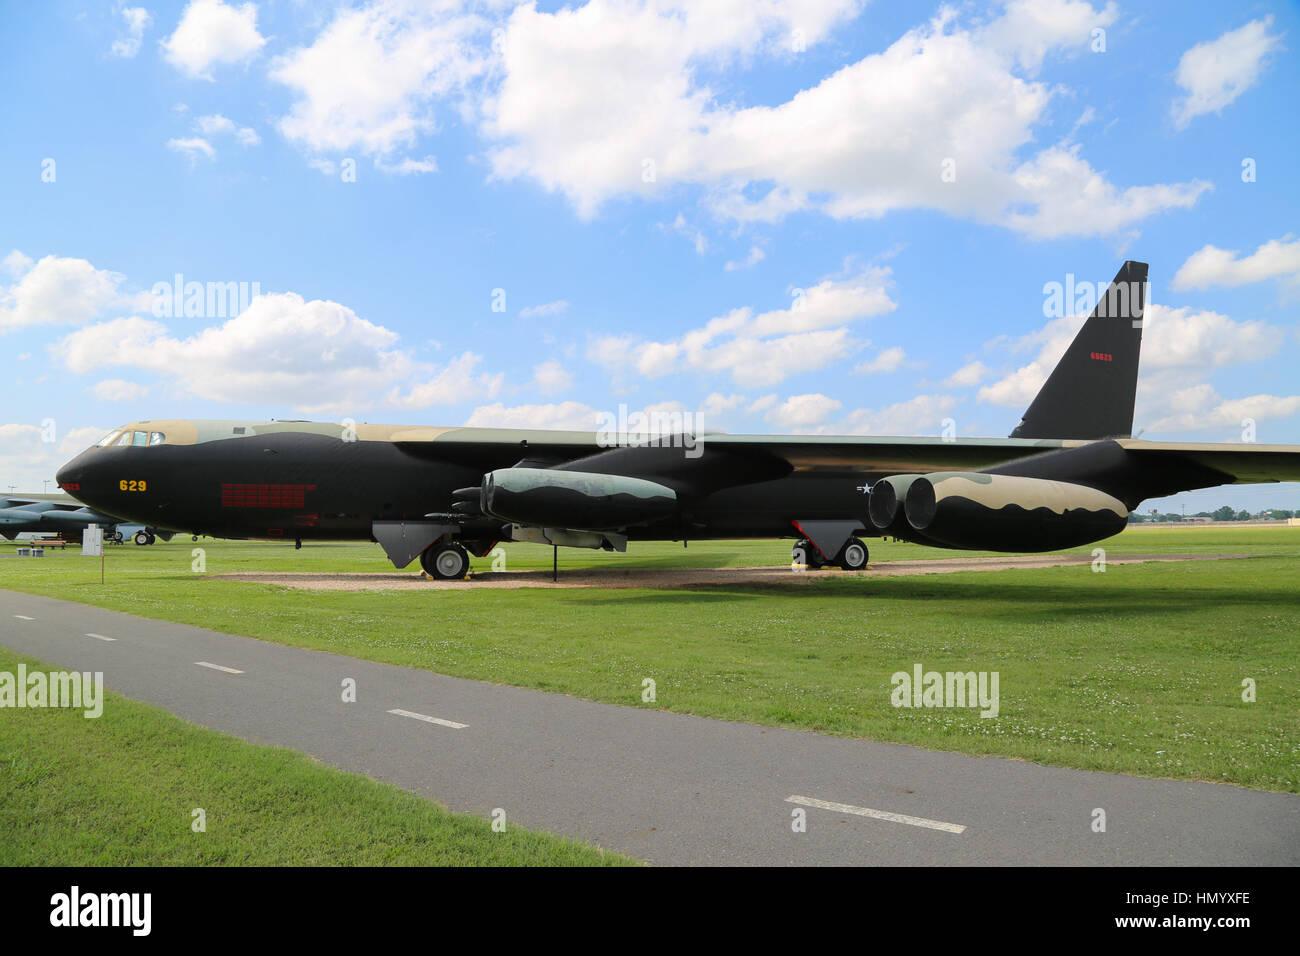 Boeing B-52 Stratofortress - Stock Image